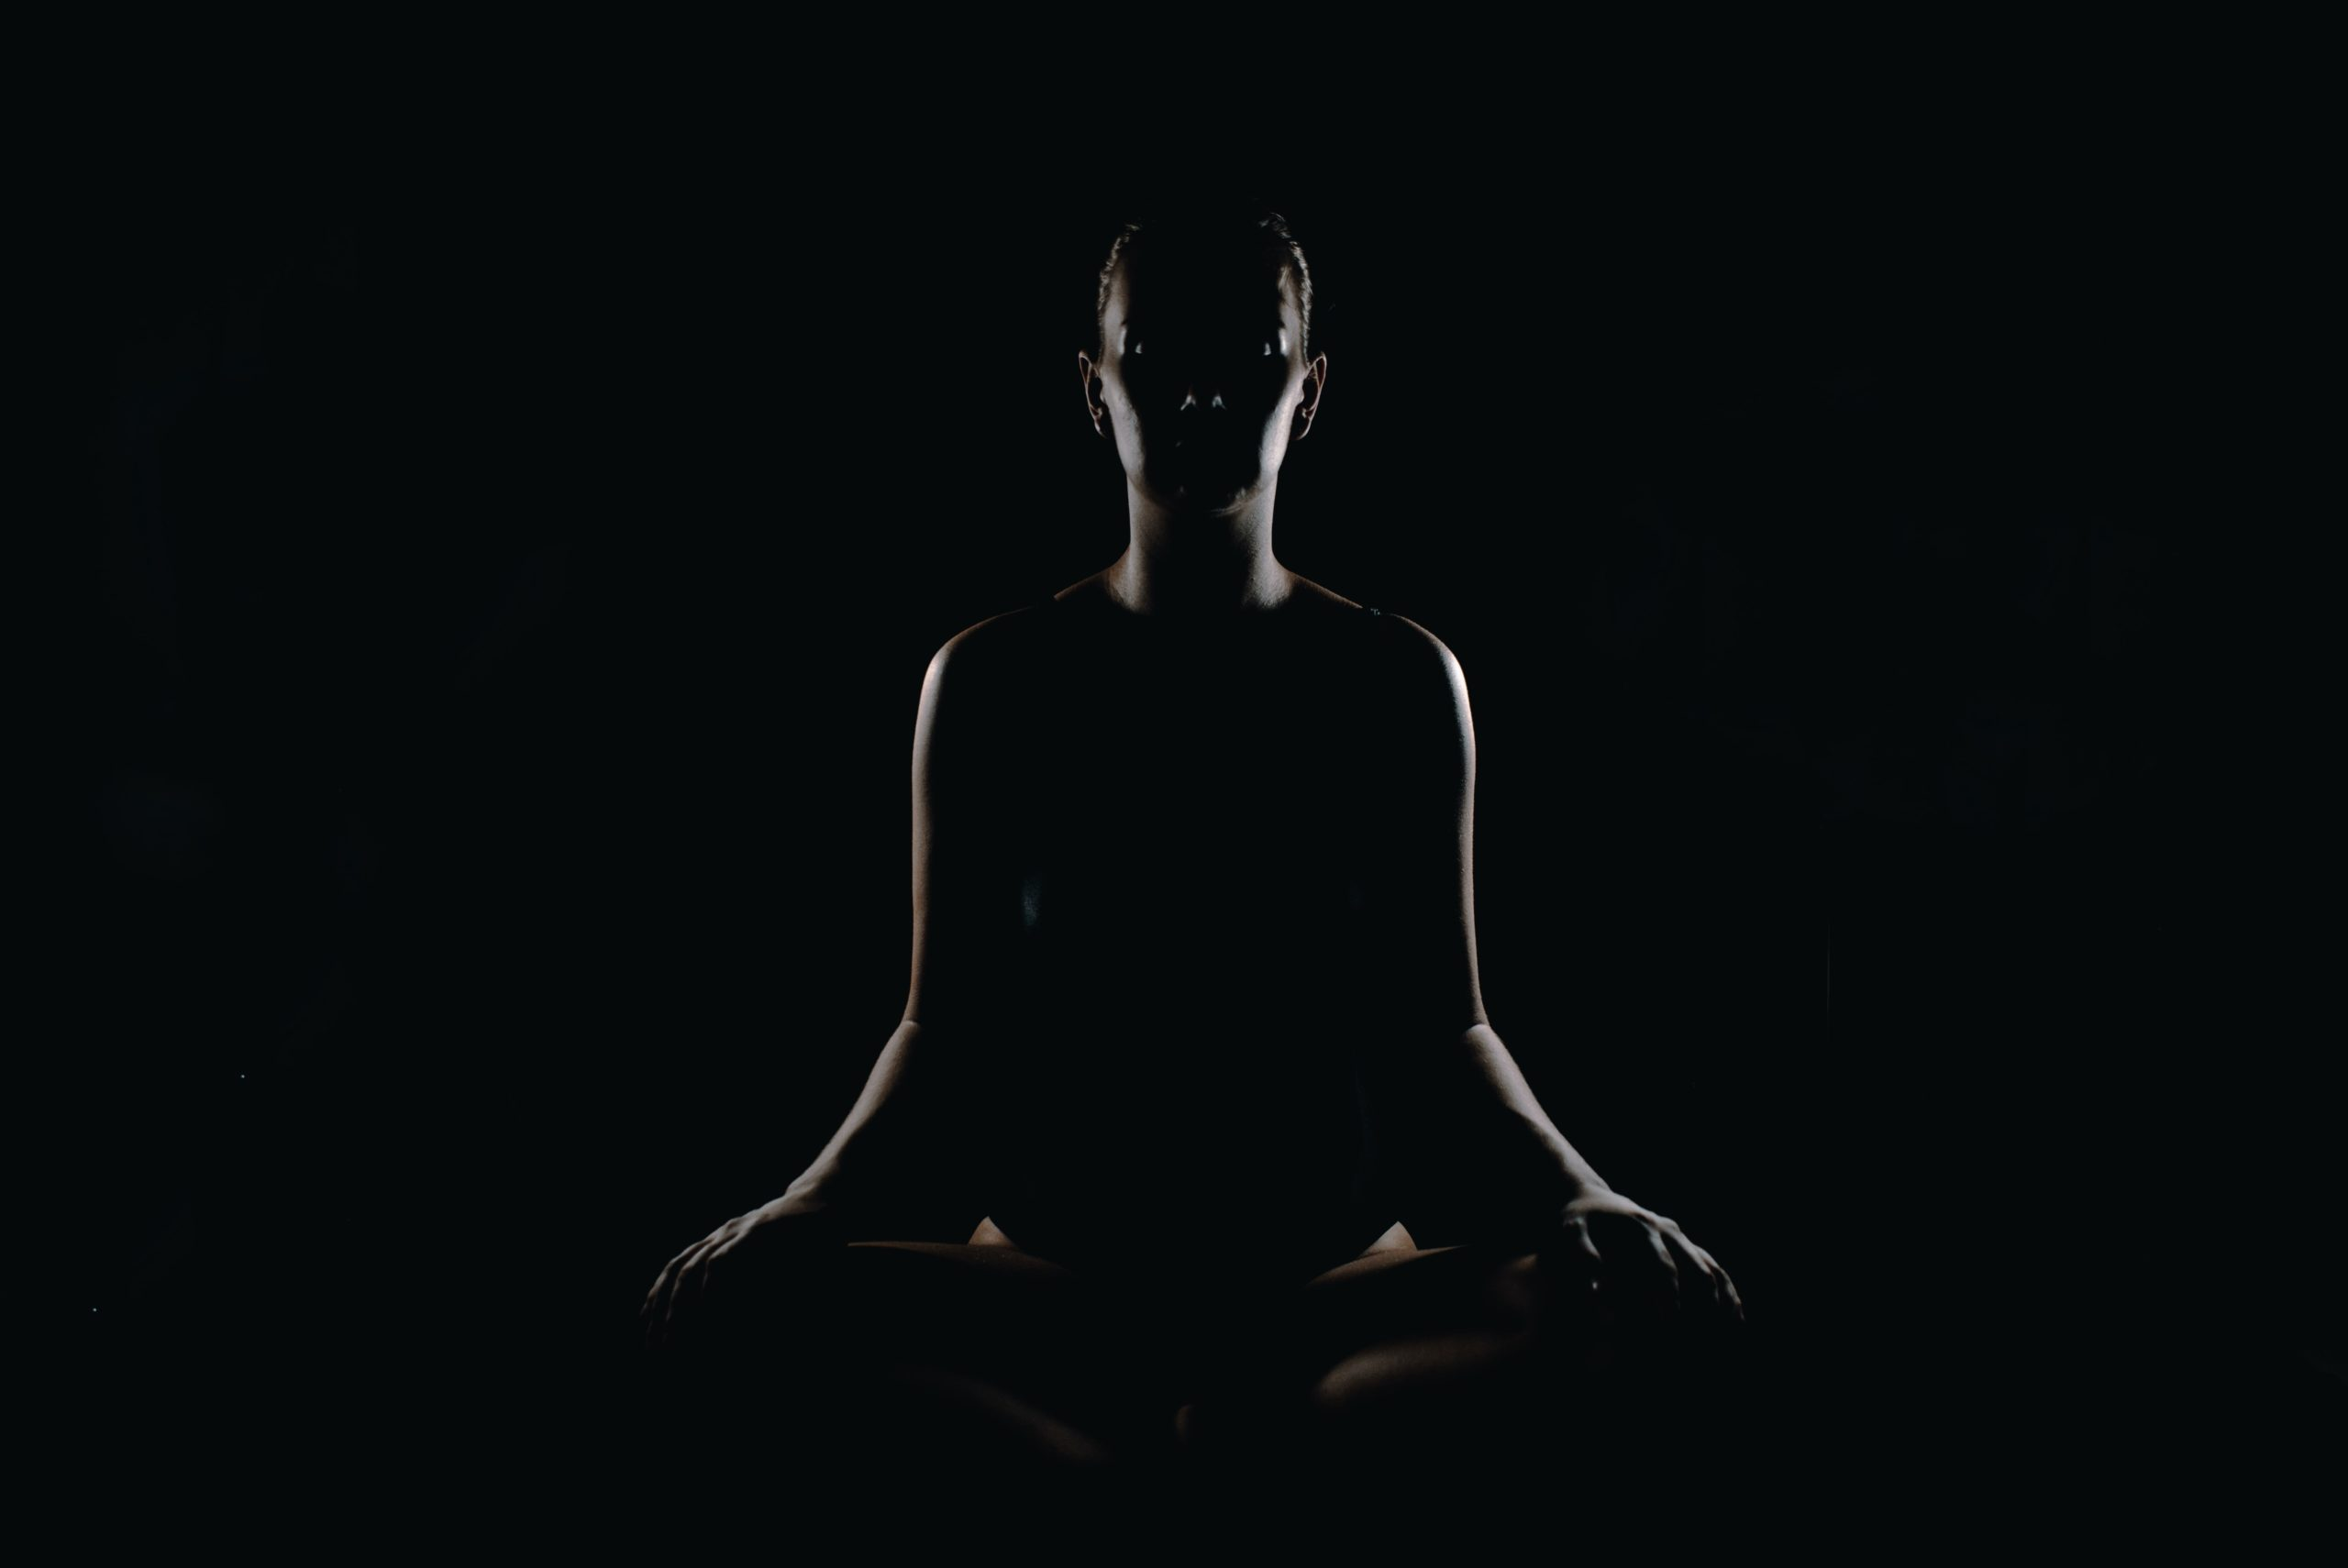 Meditation for Mental Peace